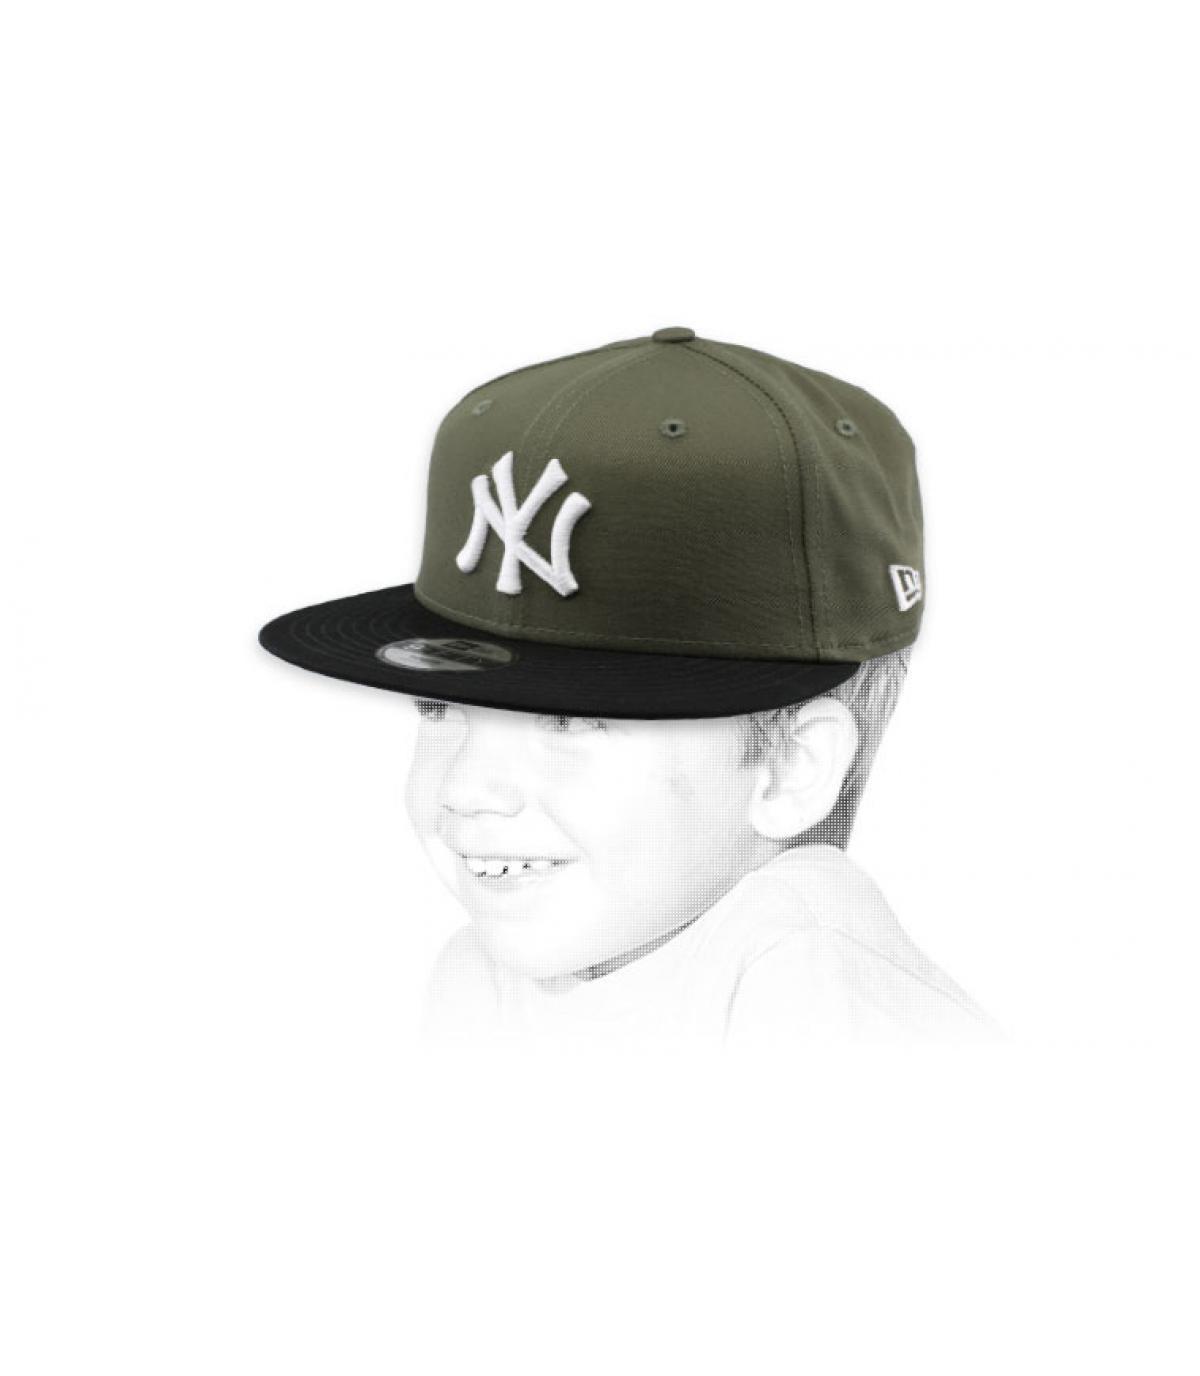 kindermuts NY groen zwart